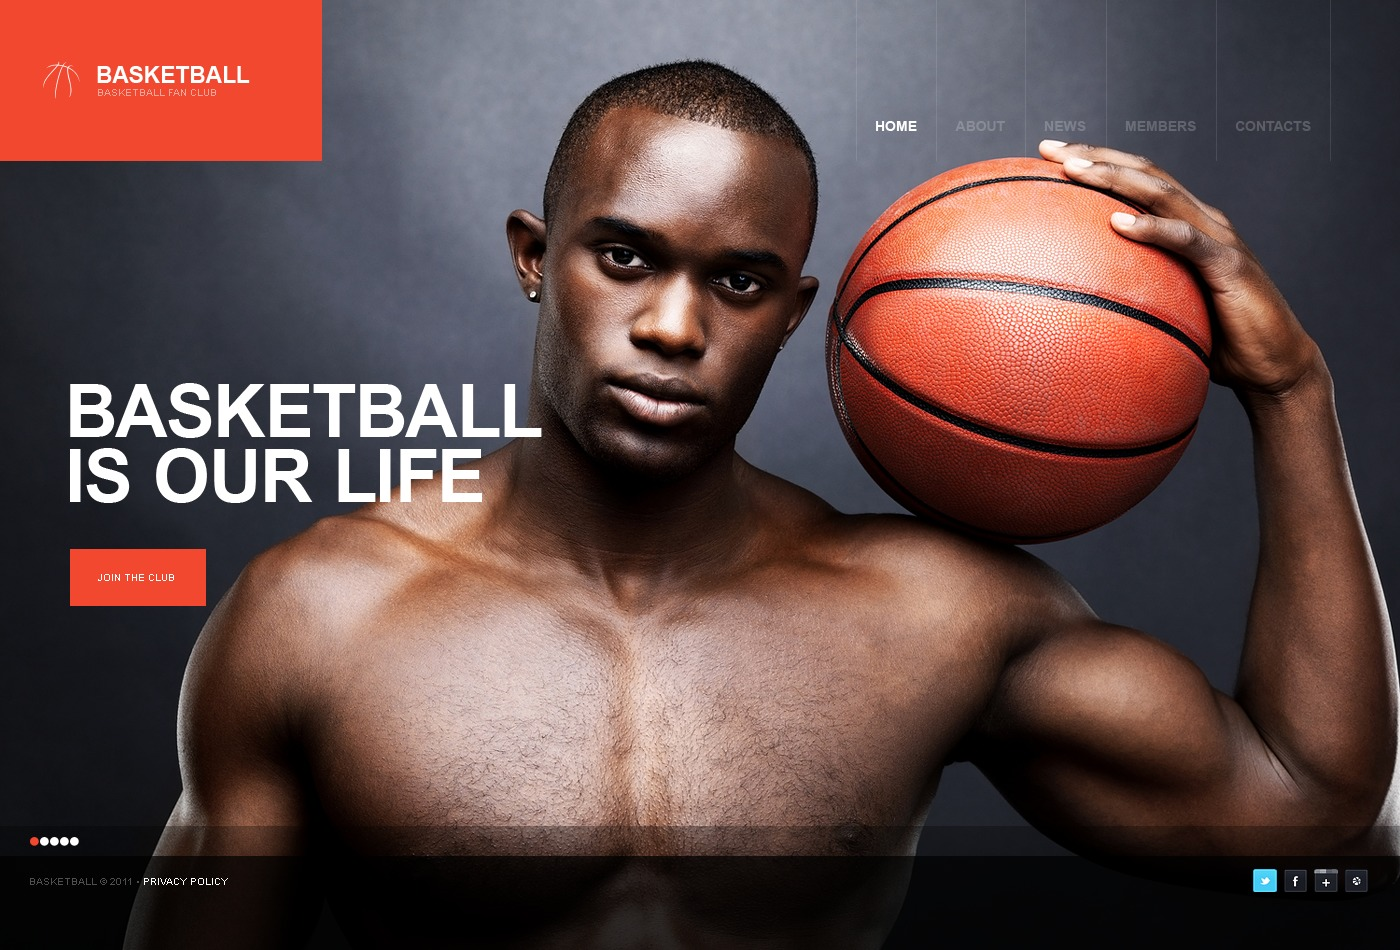 Thème WordPress pour site de basketball #36009 - screenshot